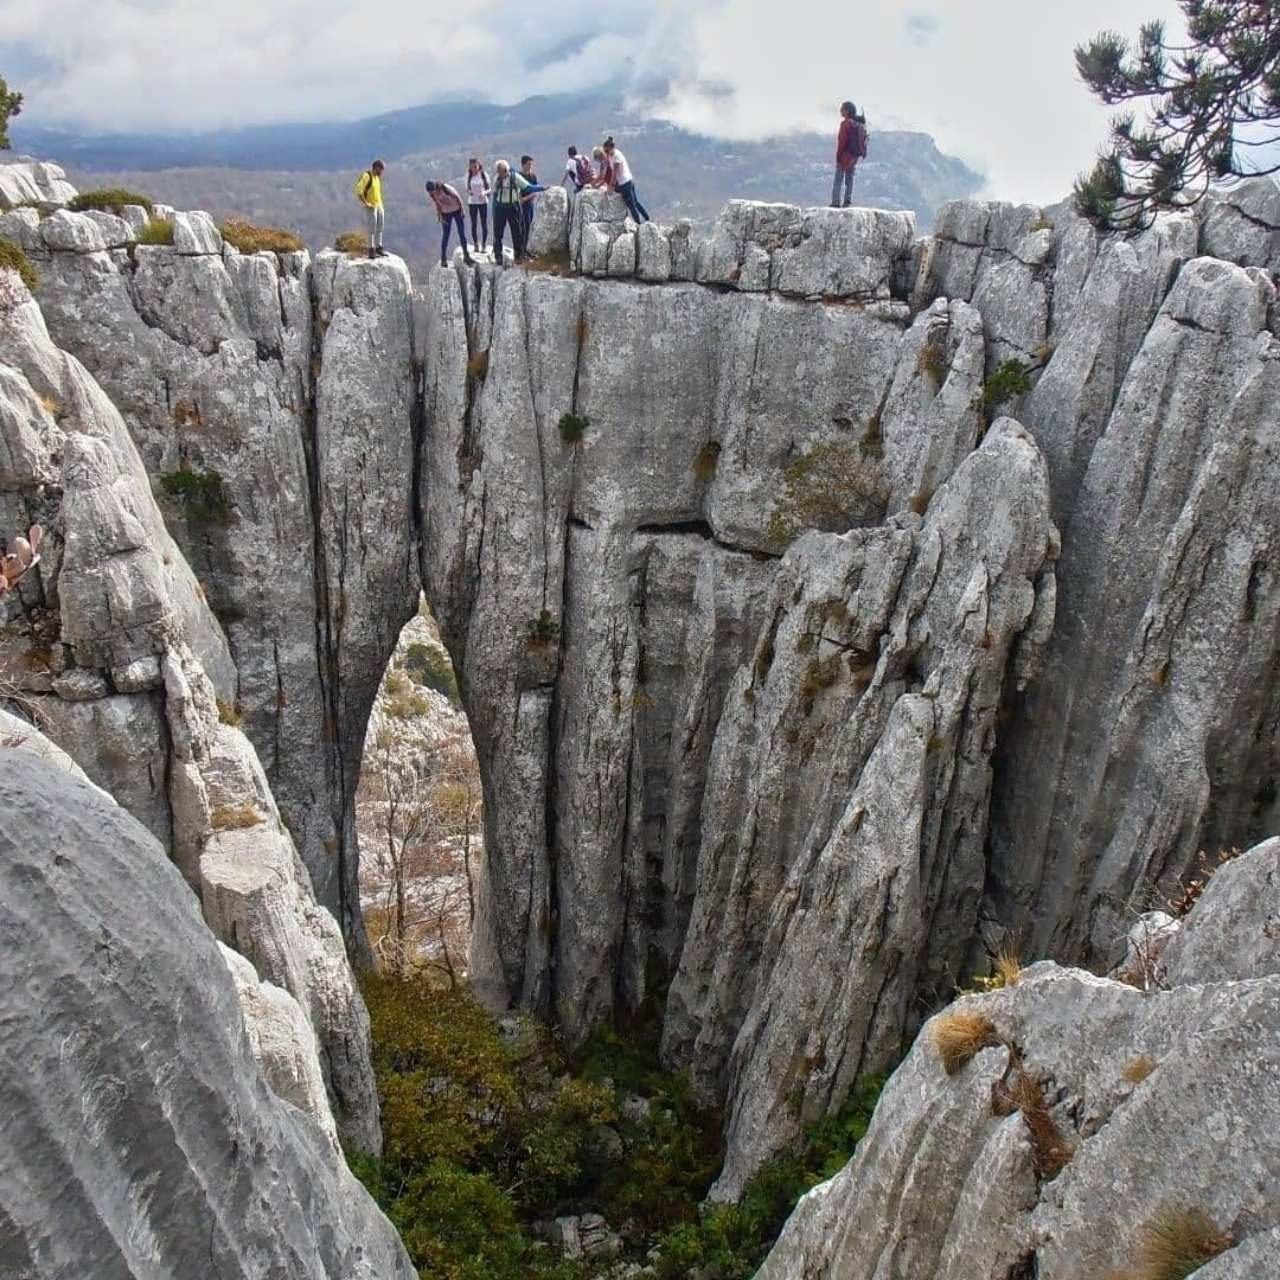 Guštajmo Orjen: Maraton, planinarenje i izložba fosila